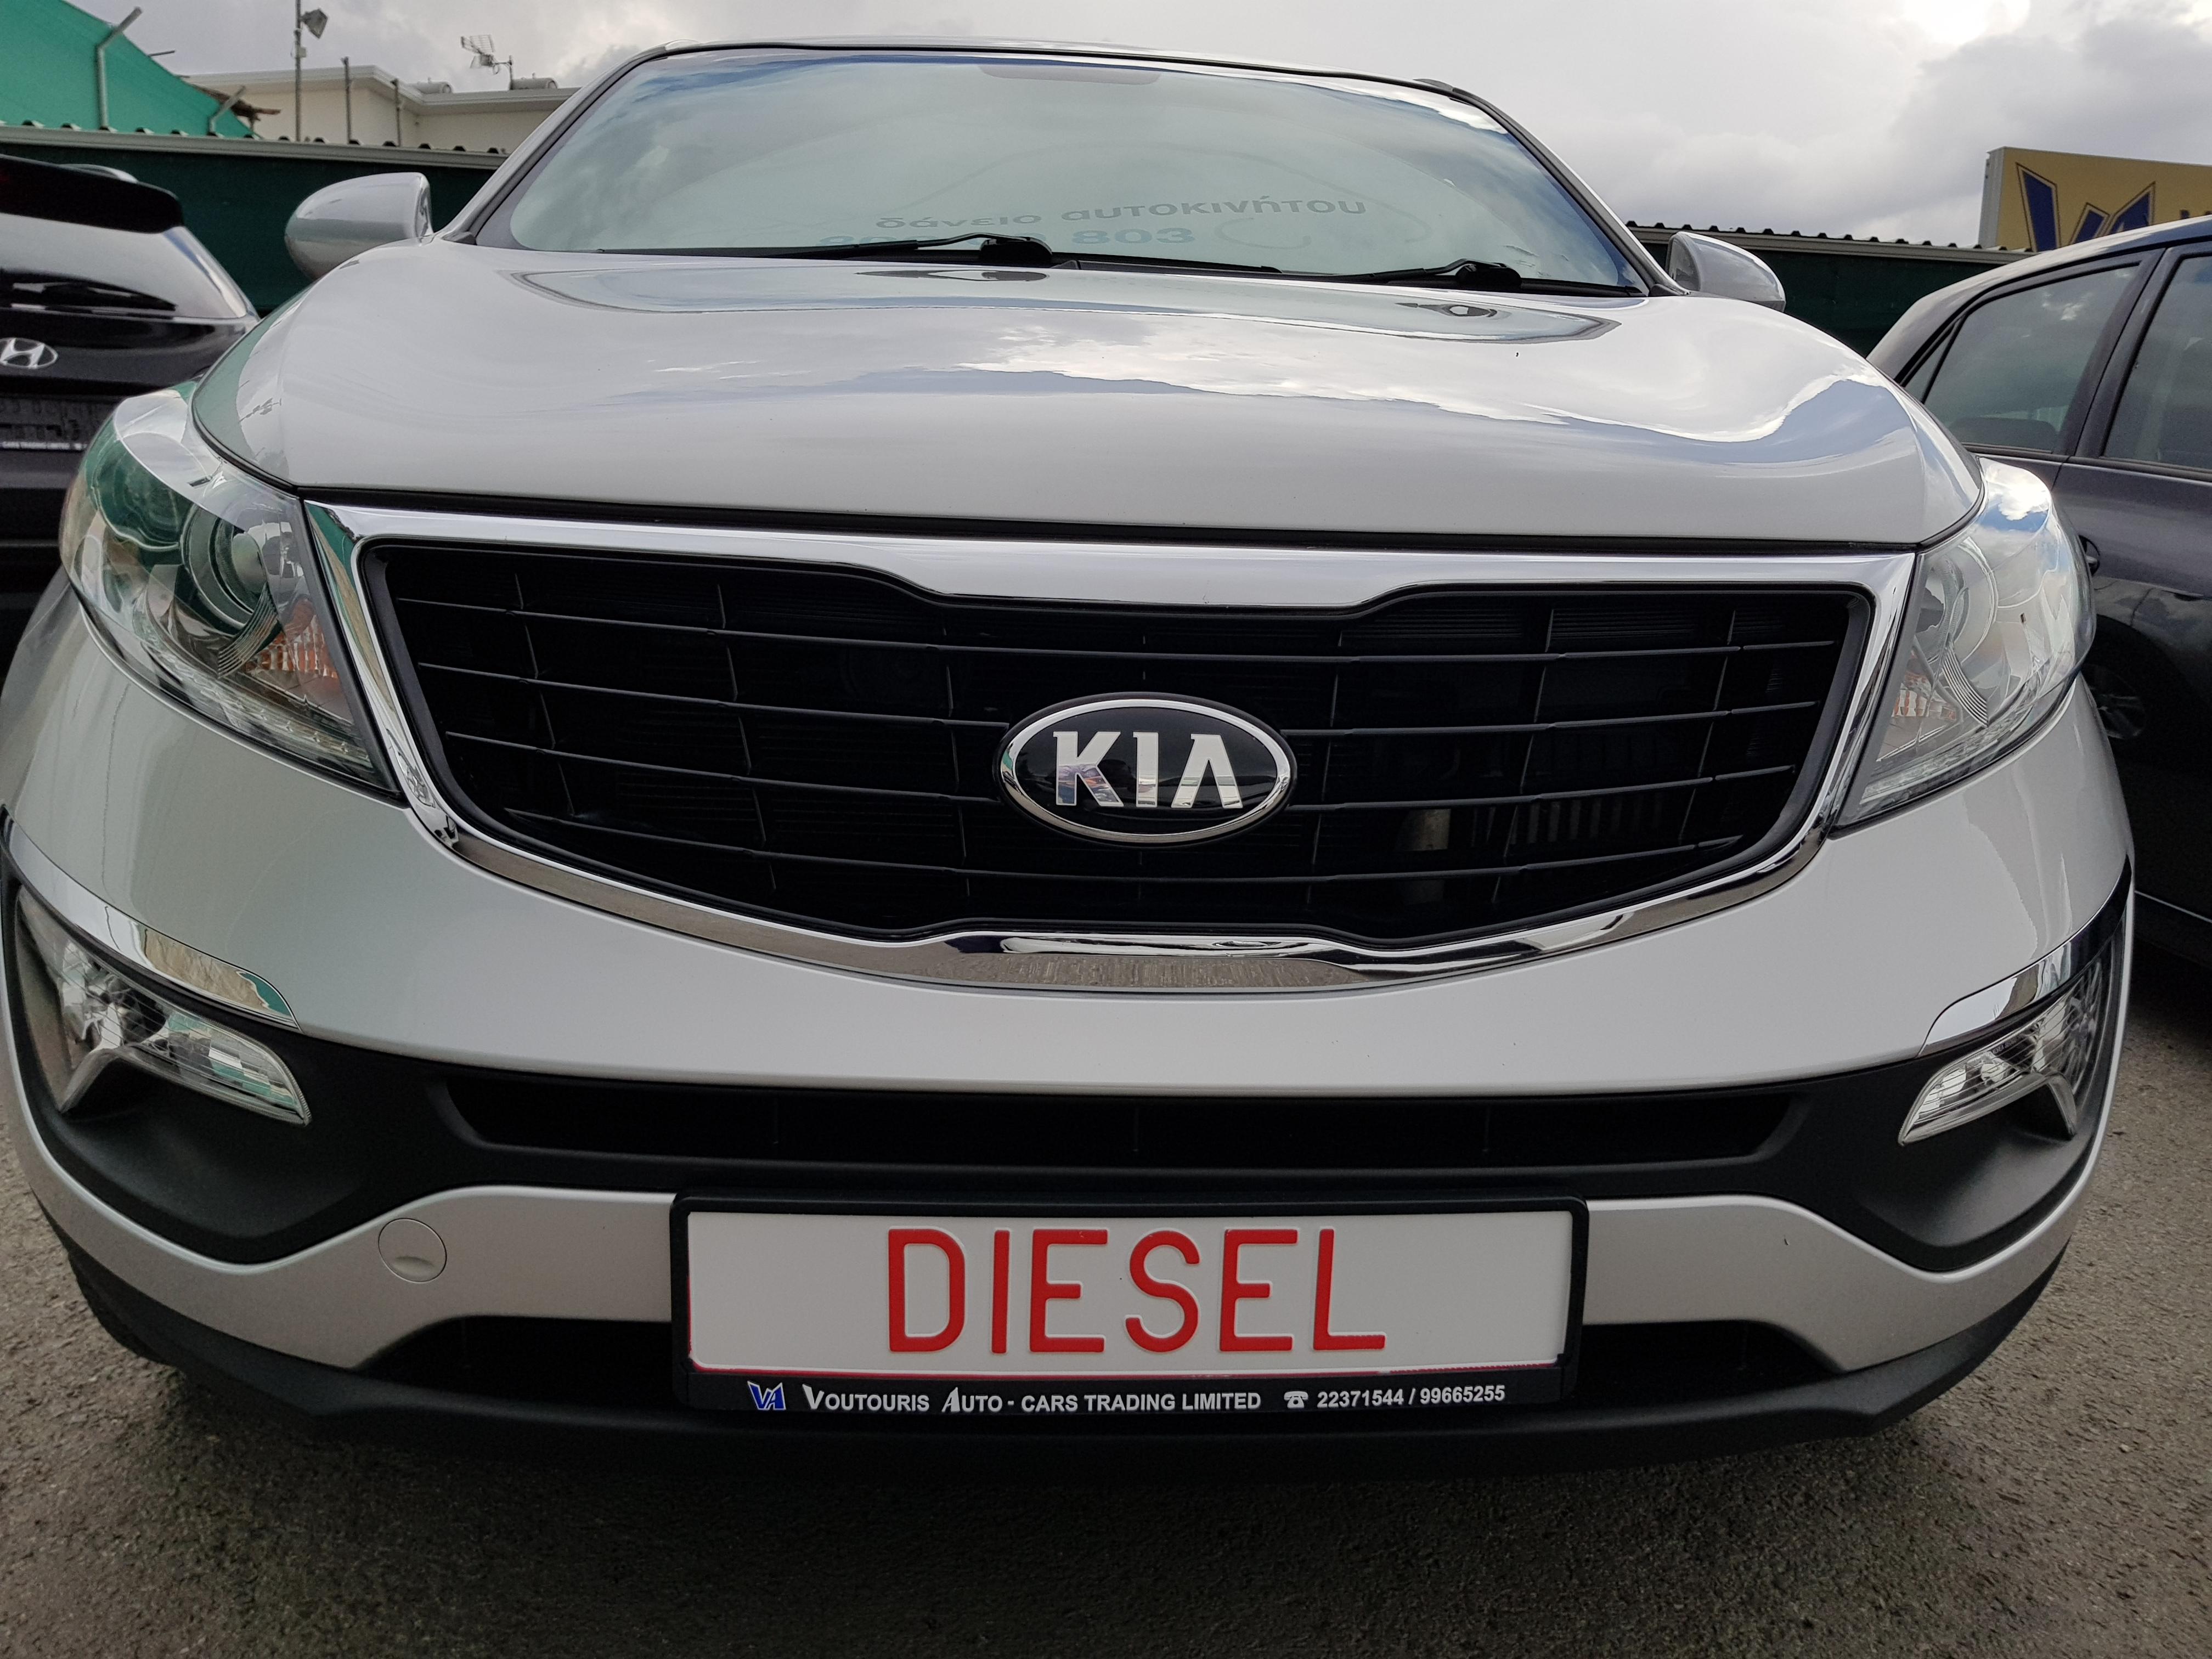 KIA Sportage Silver